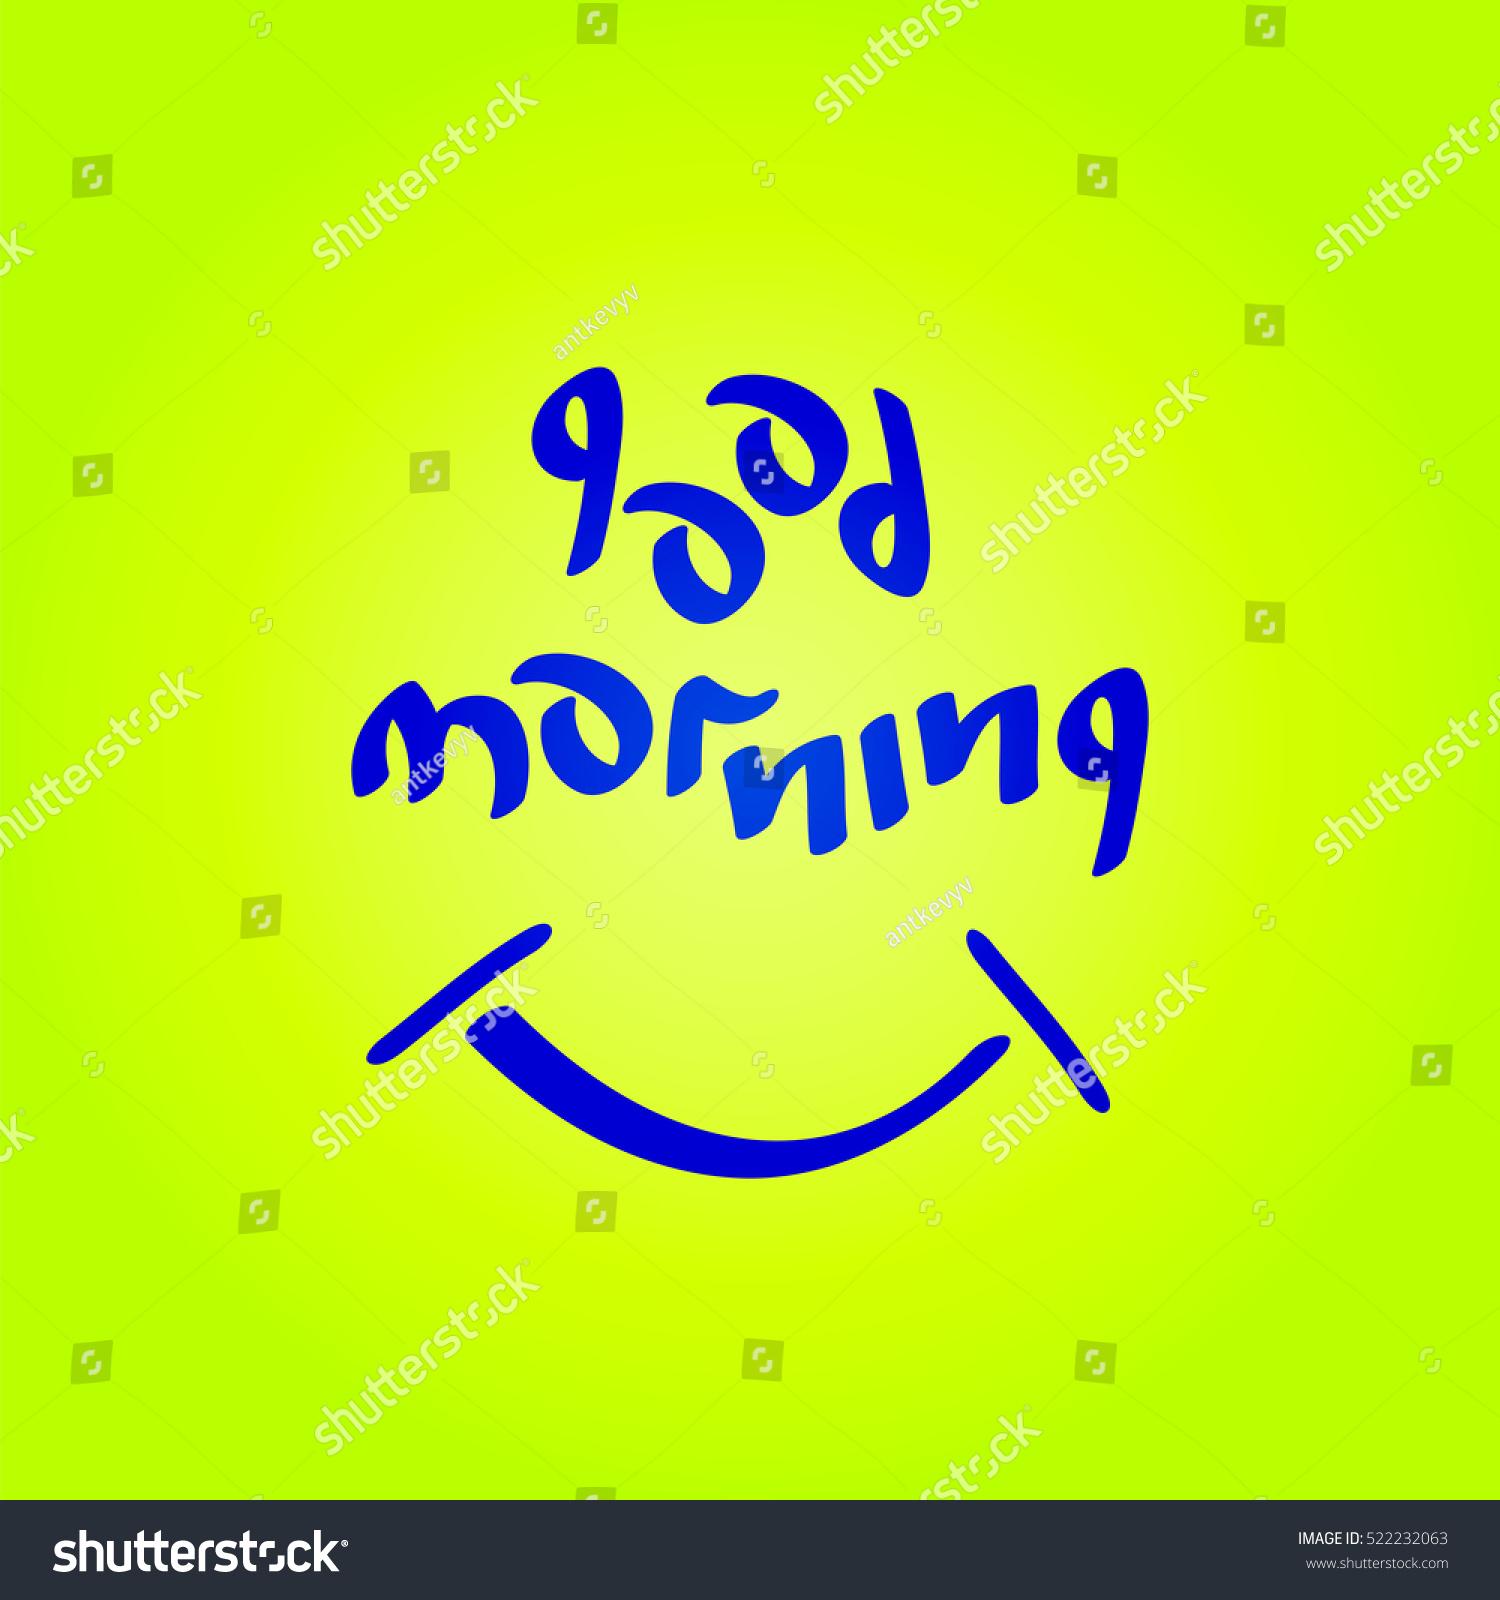 Good morning text smiling symbol fun stock vector 522232063 good morning text with smiling symbol fun positive mood vector illustration biocorpaavc Images